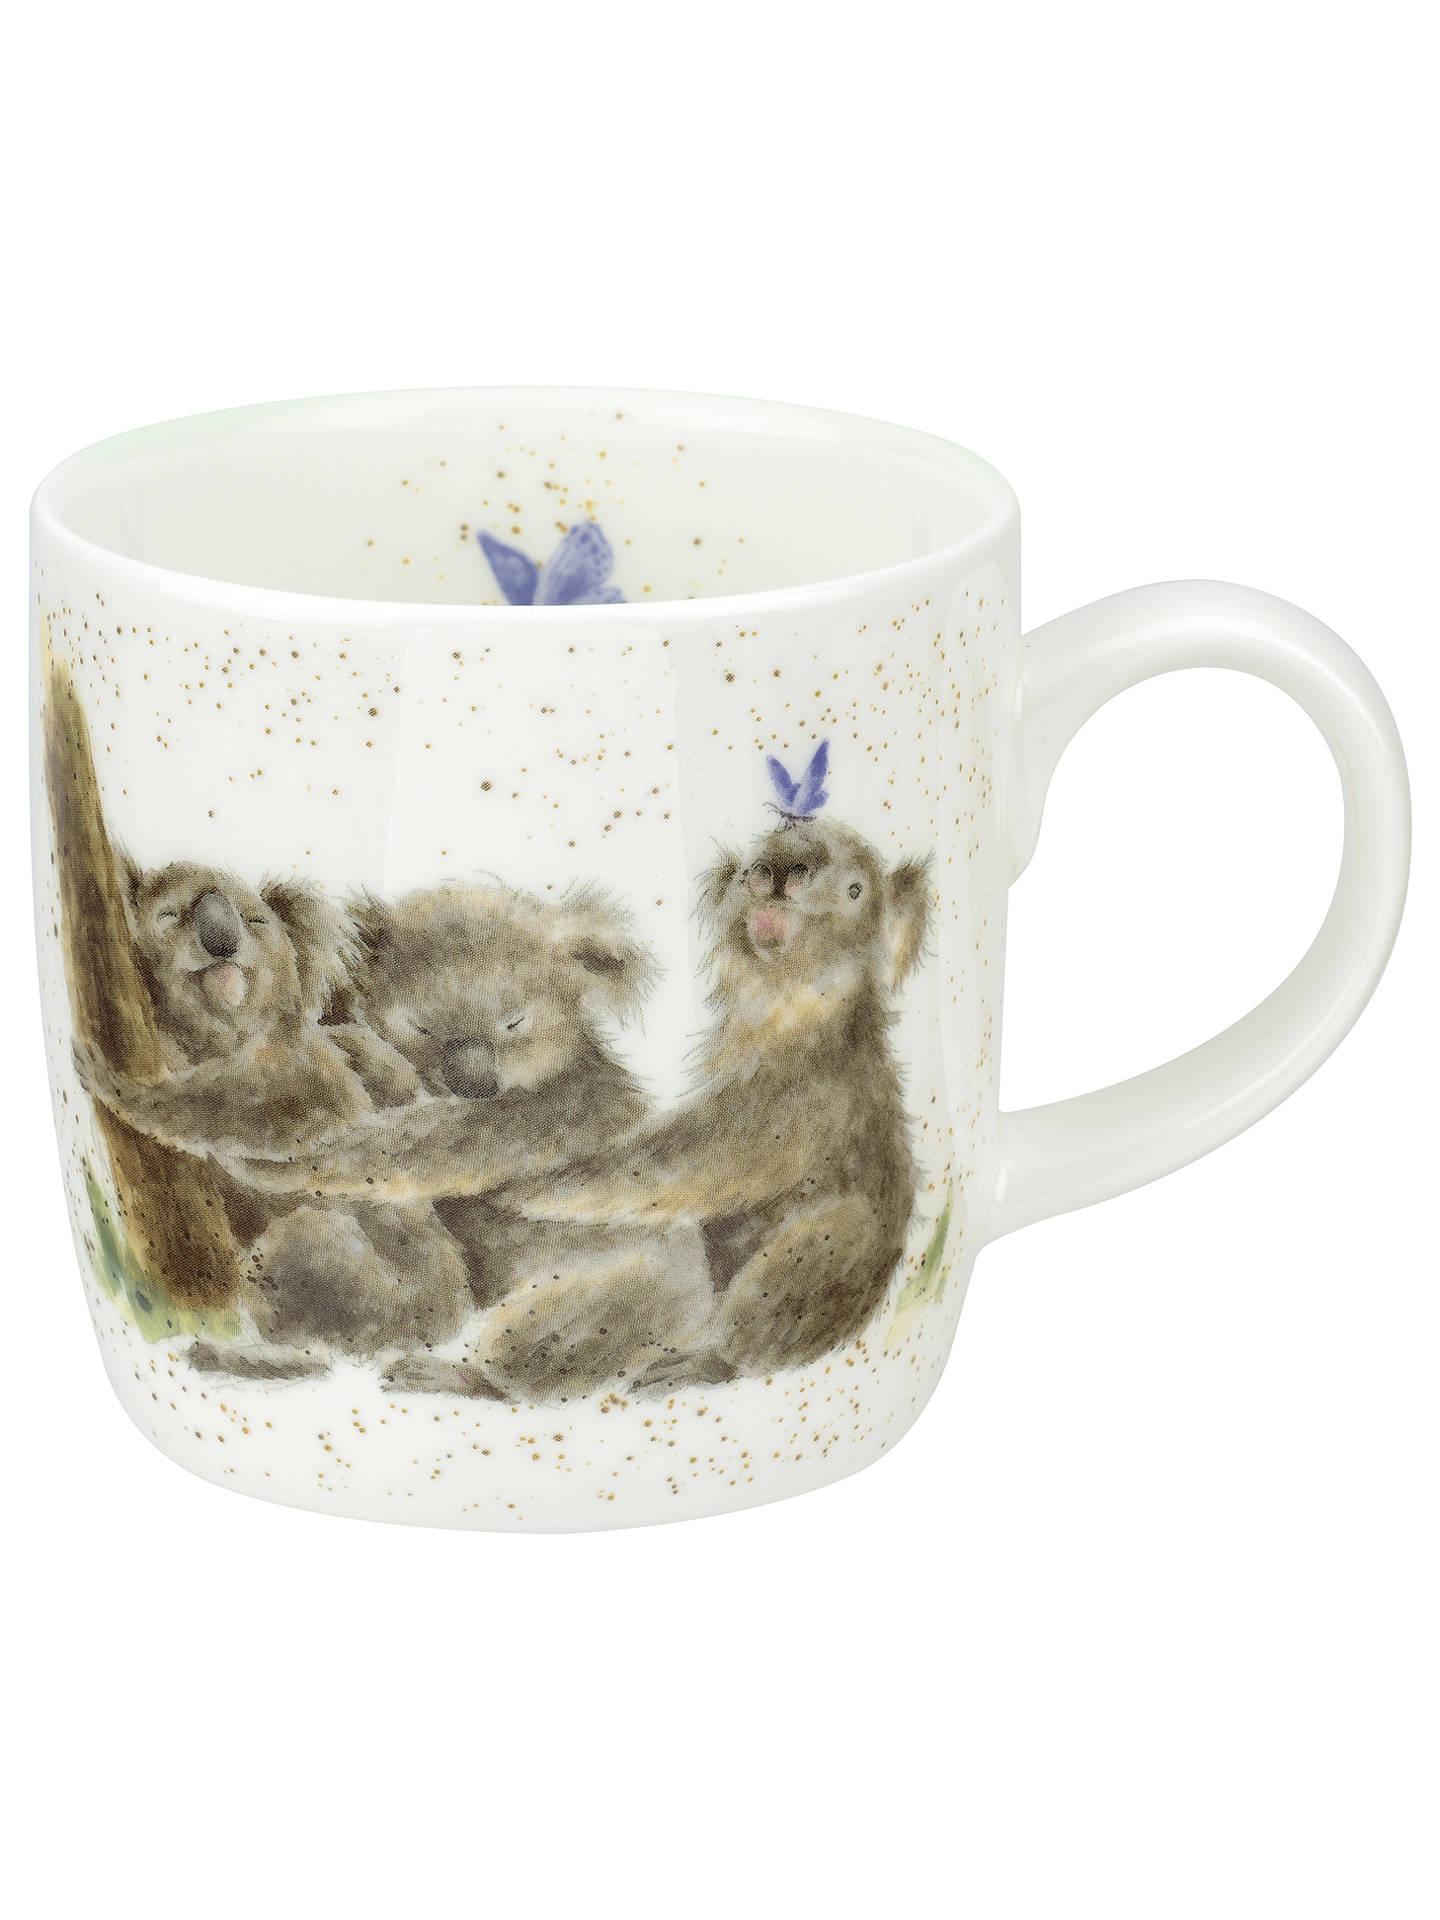 royal worcester wrendale koala mug multi 310ml at john. Black Bedroom Furniture Sets. Home Design Ideas